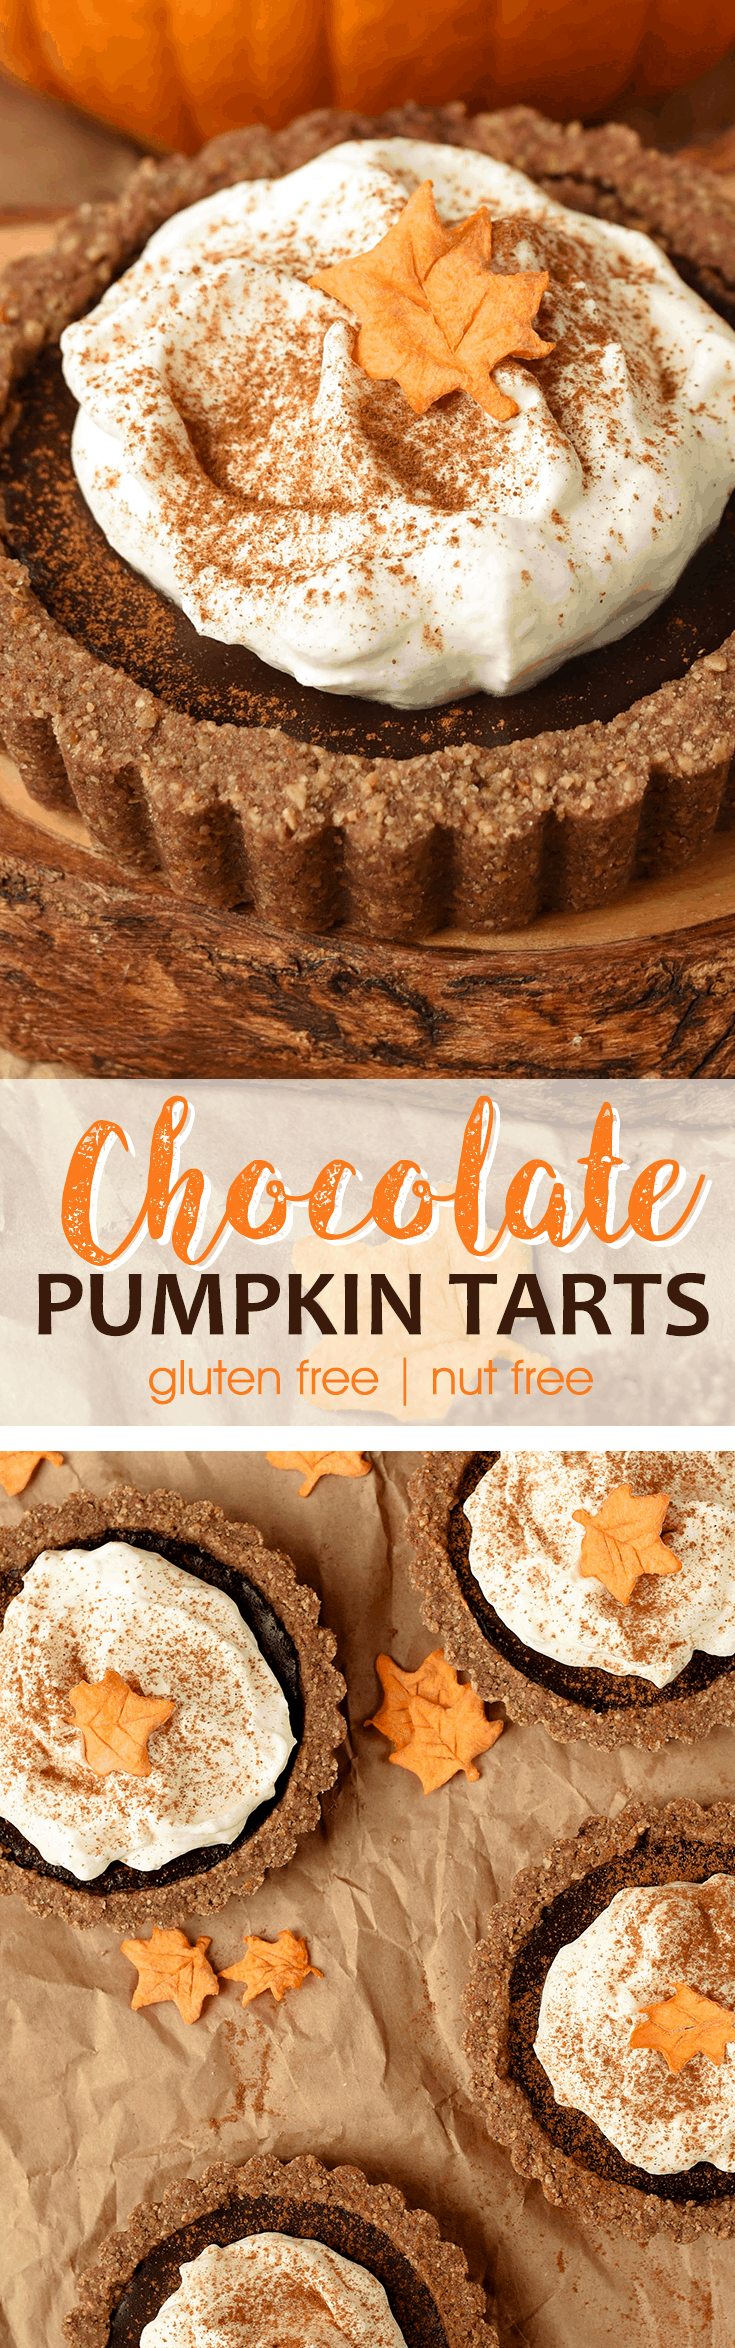 Pumpkin Chocolate Tarts Pin - Pumpkin Chocolate Tarts with Pepita Crust